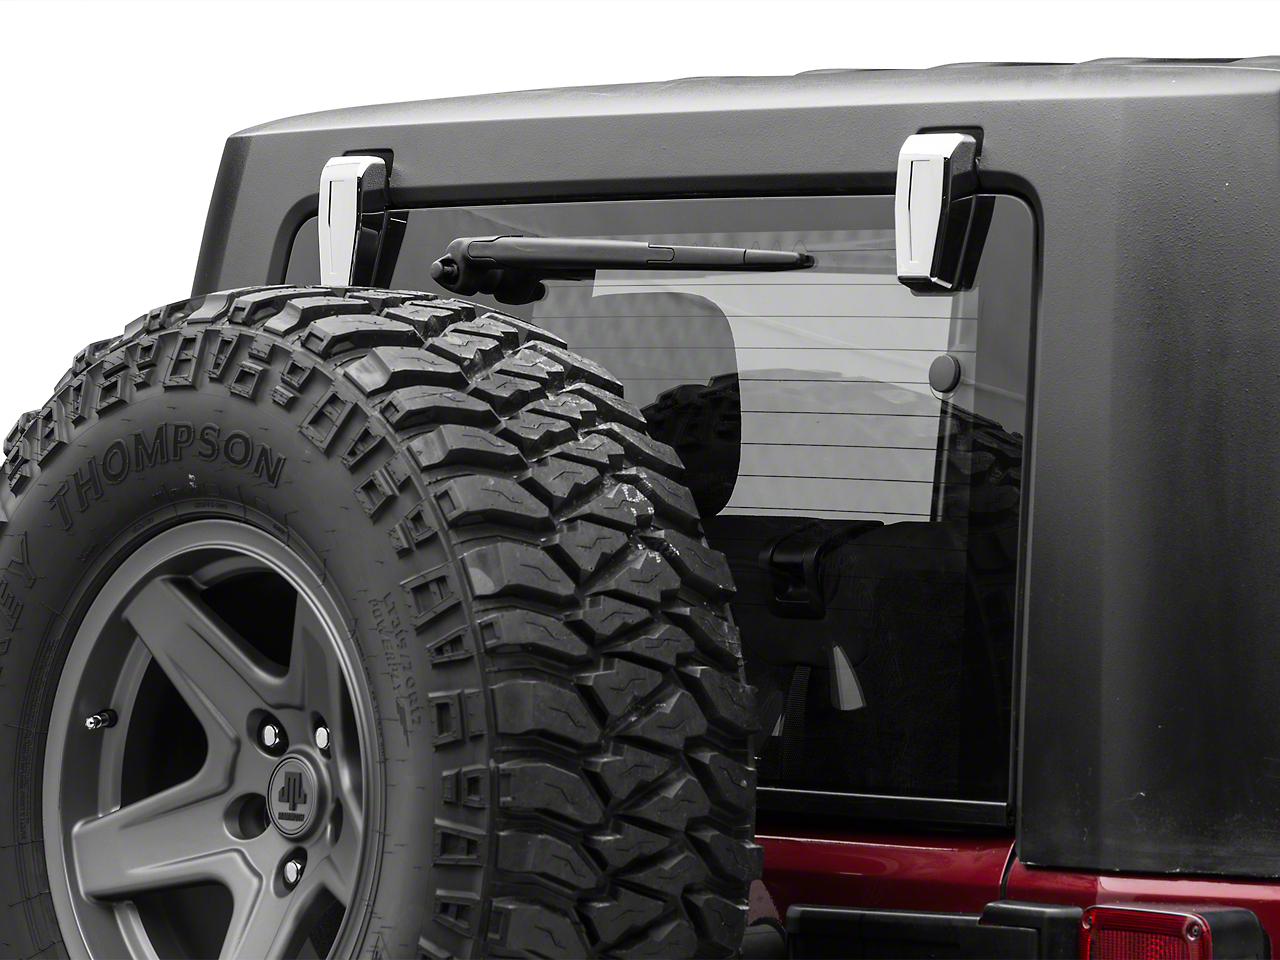 Putco Chrome Rear Upper Hinge Covers (08-18 Jeep Wrangler JK)